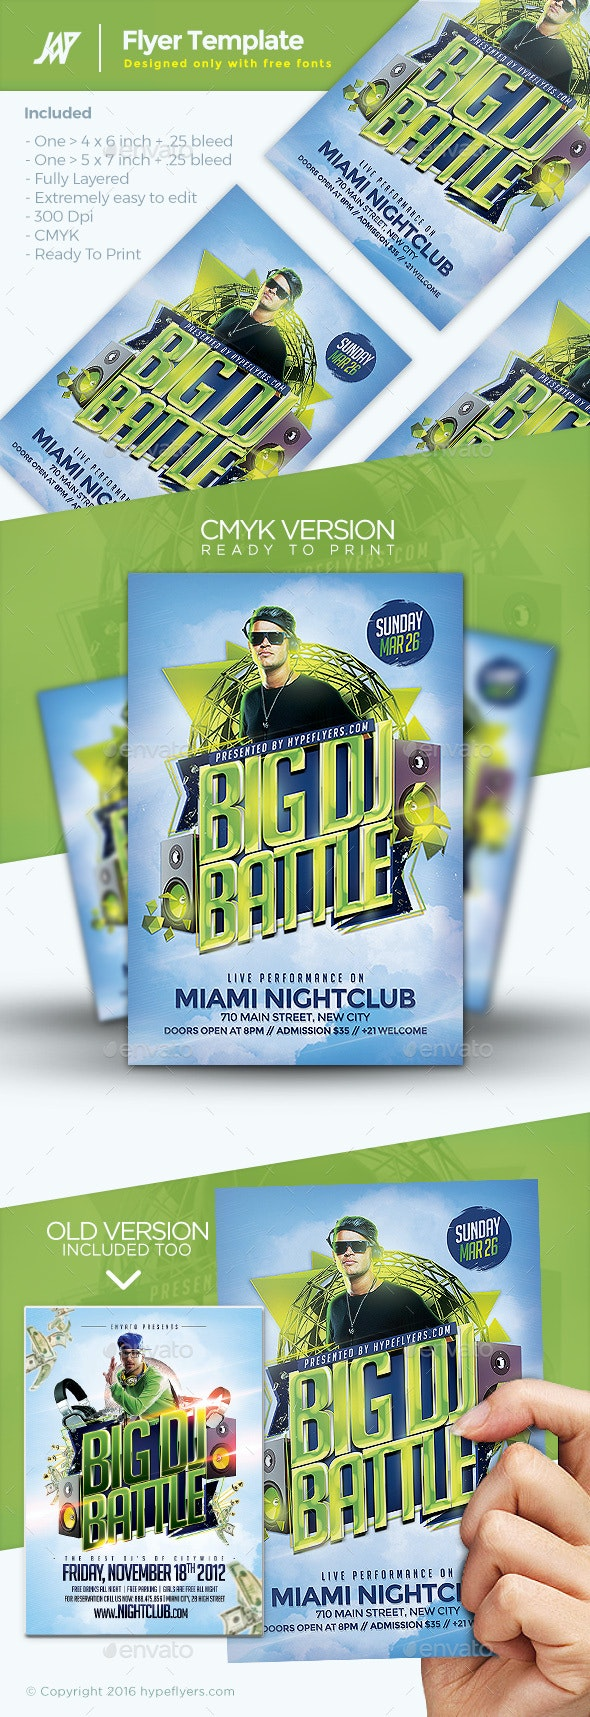 Dj Battle Flyer - Clubs & Parties Events